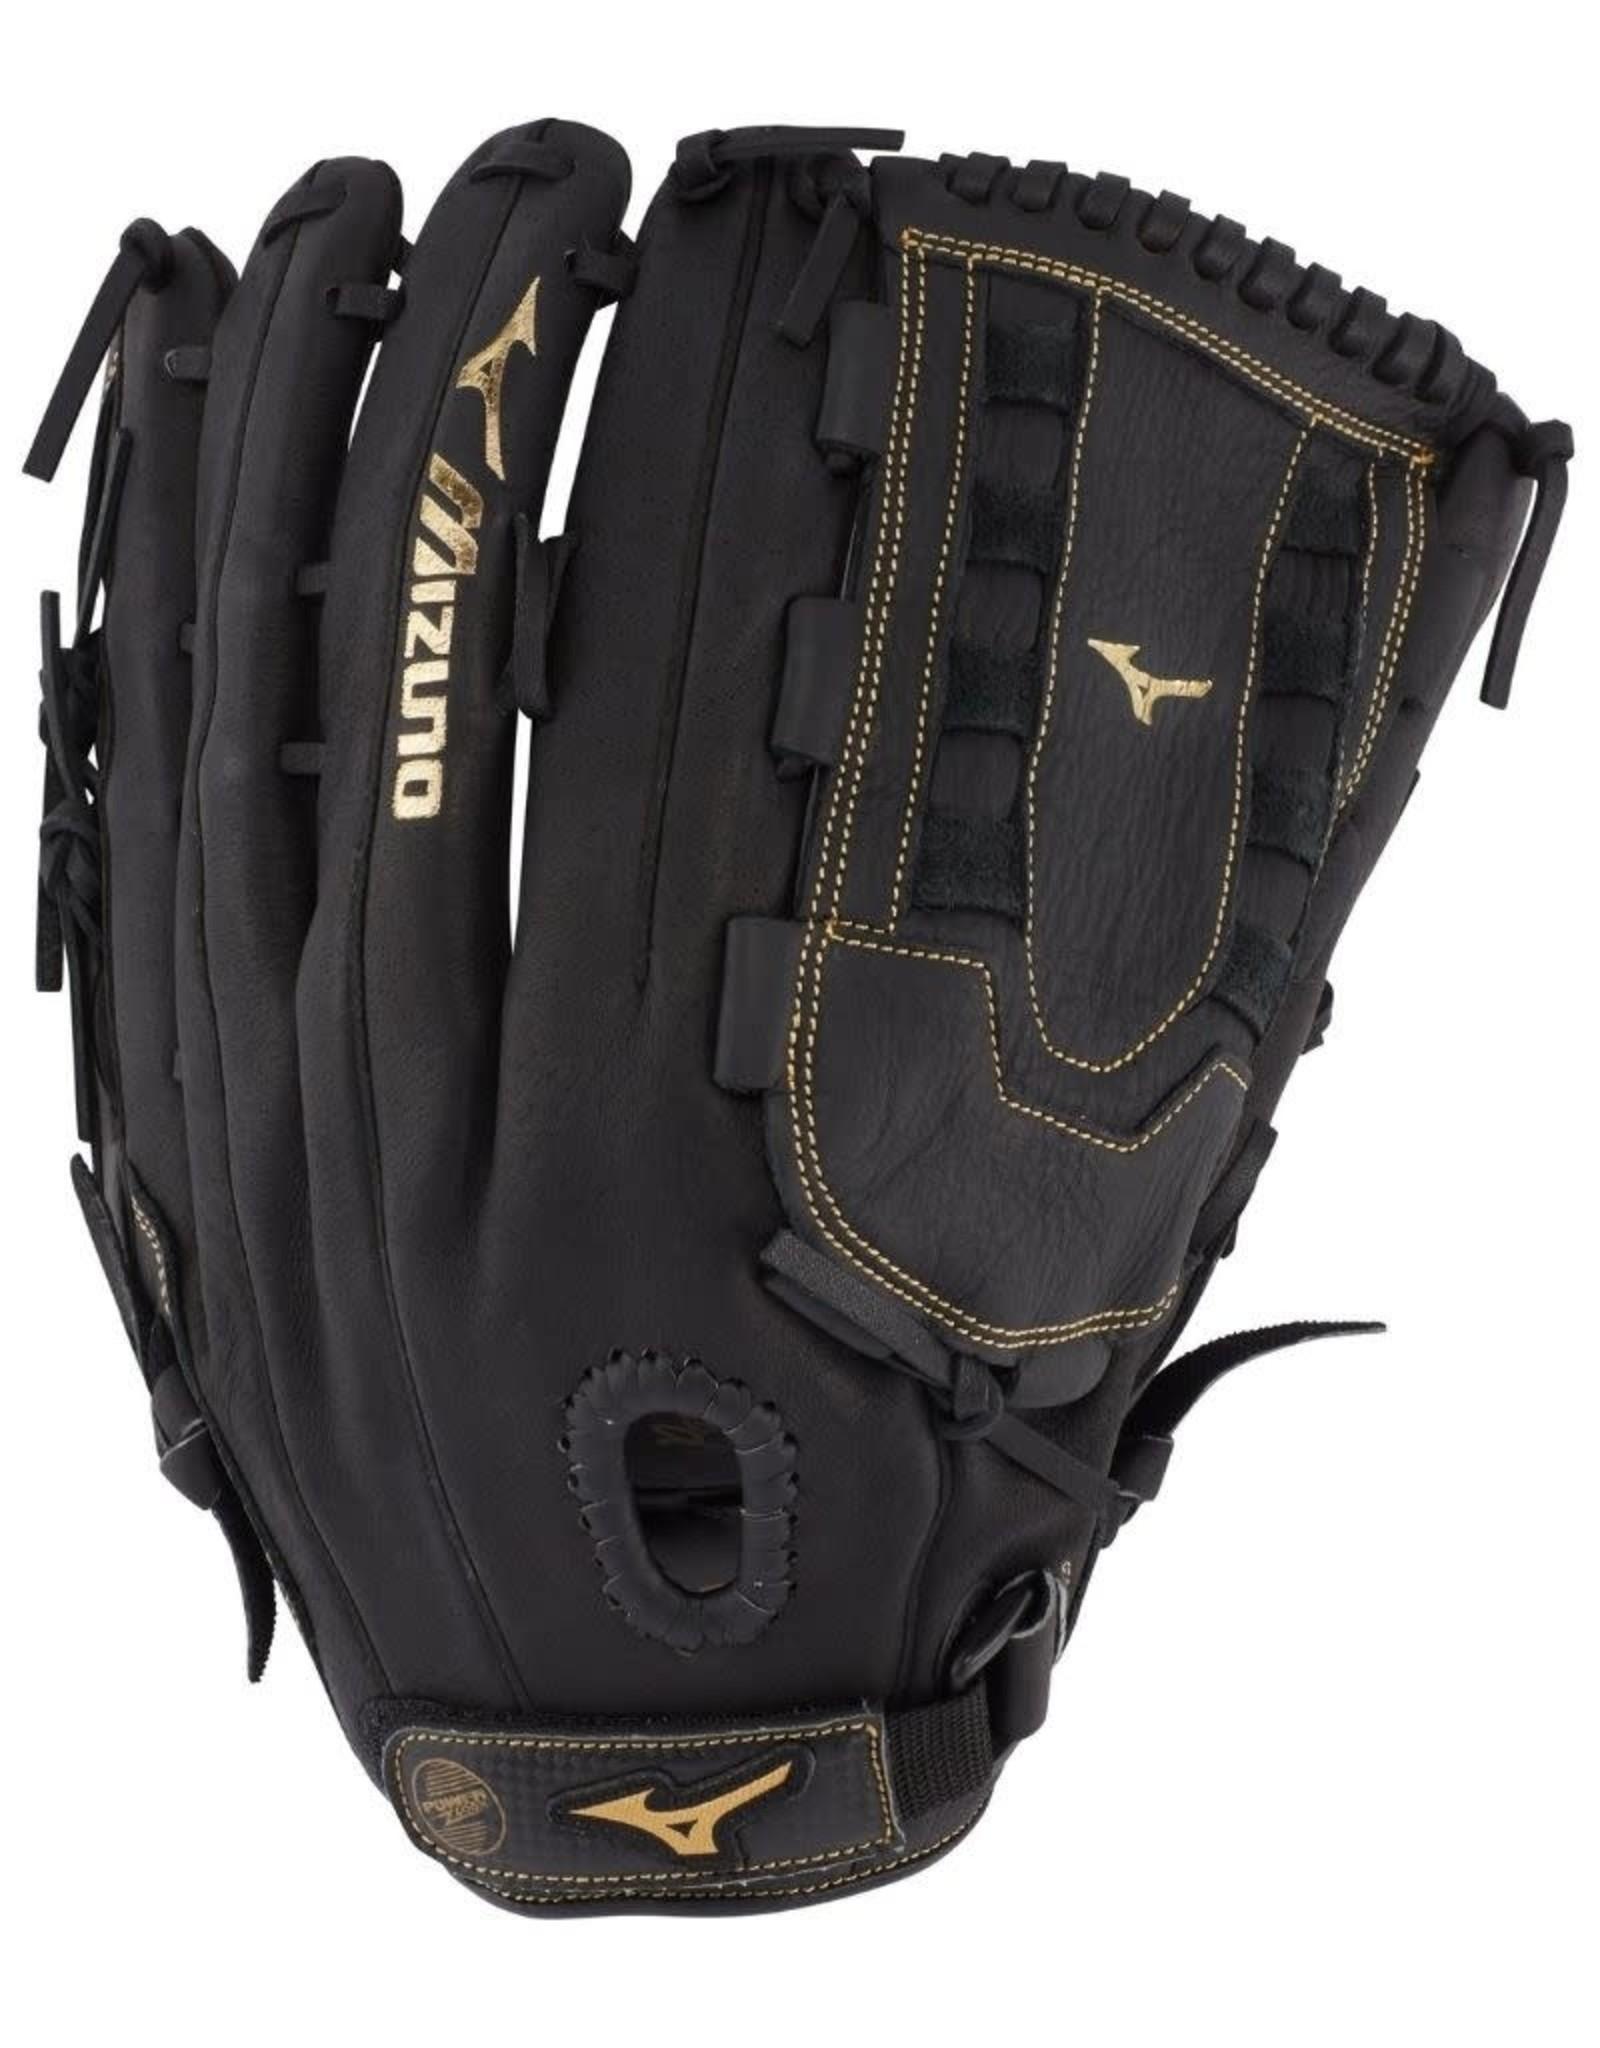 Mizuno Premier Baseball Glove RH Black/Gold 14